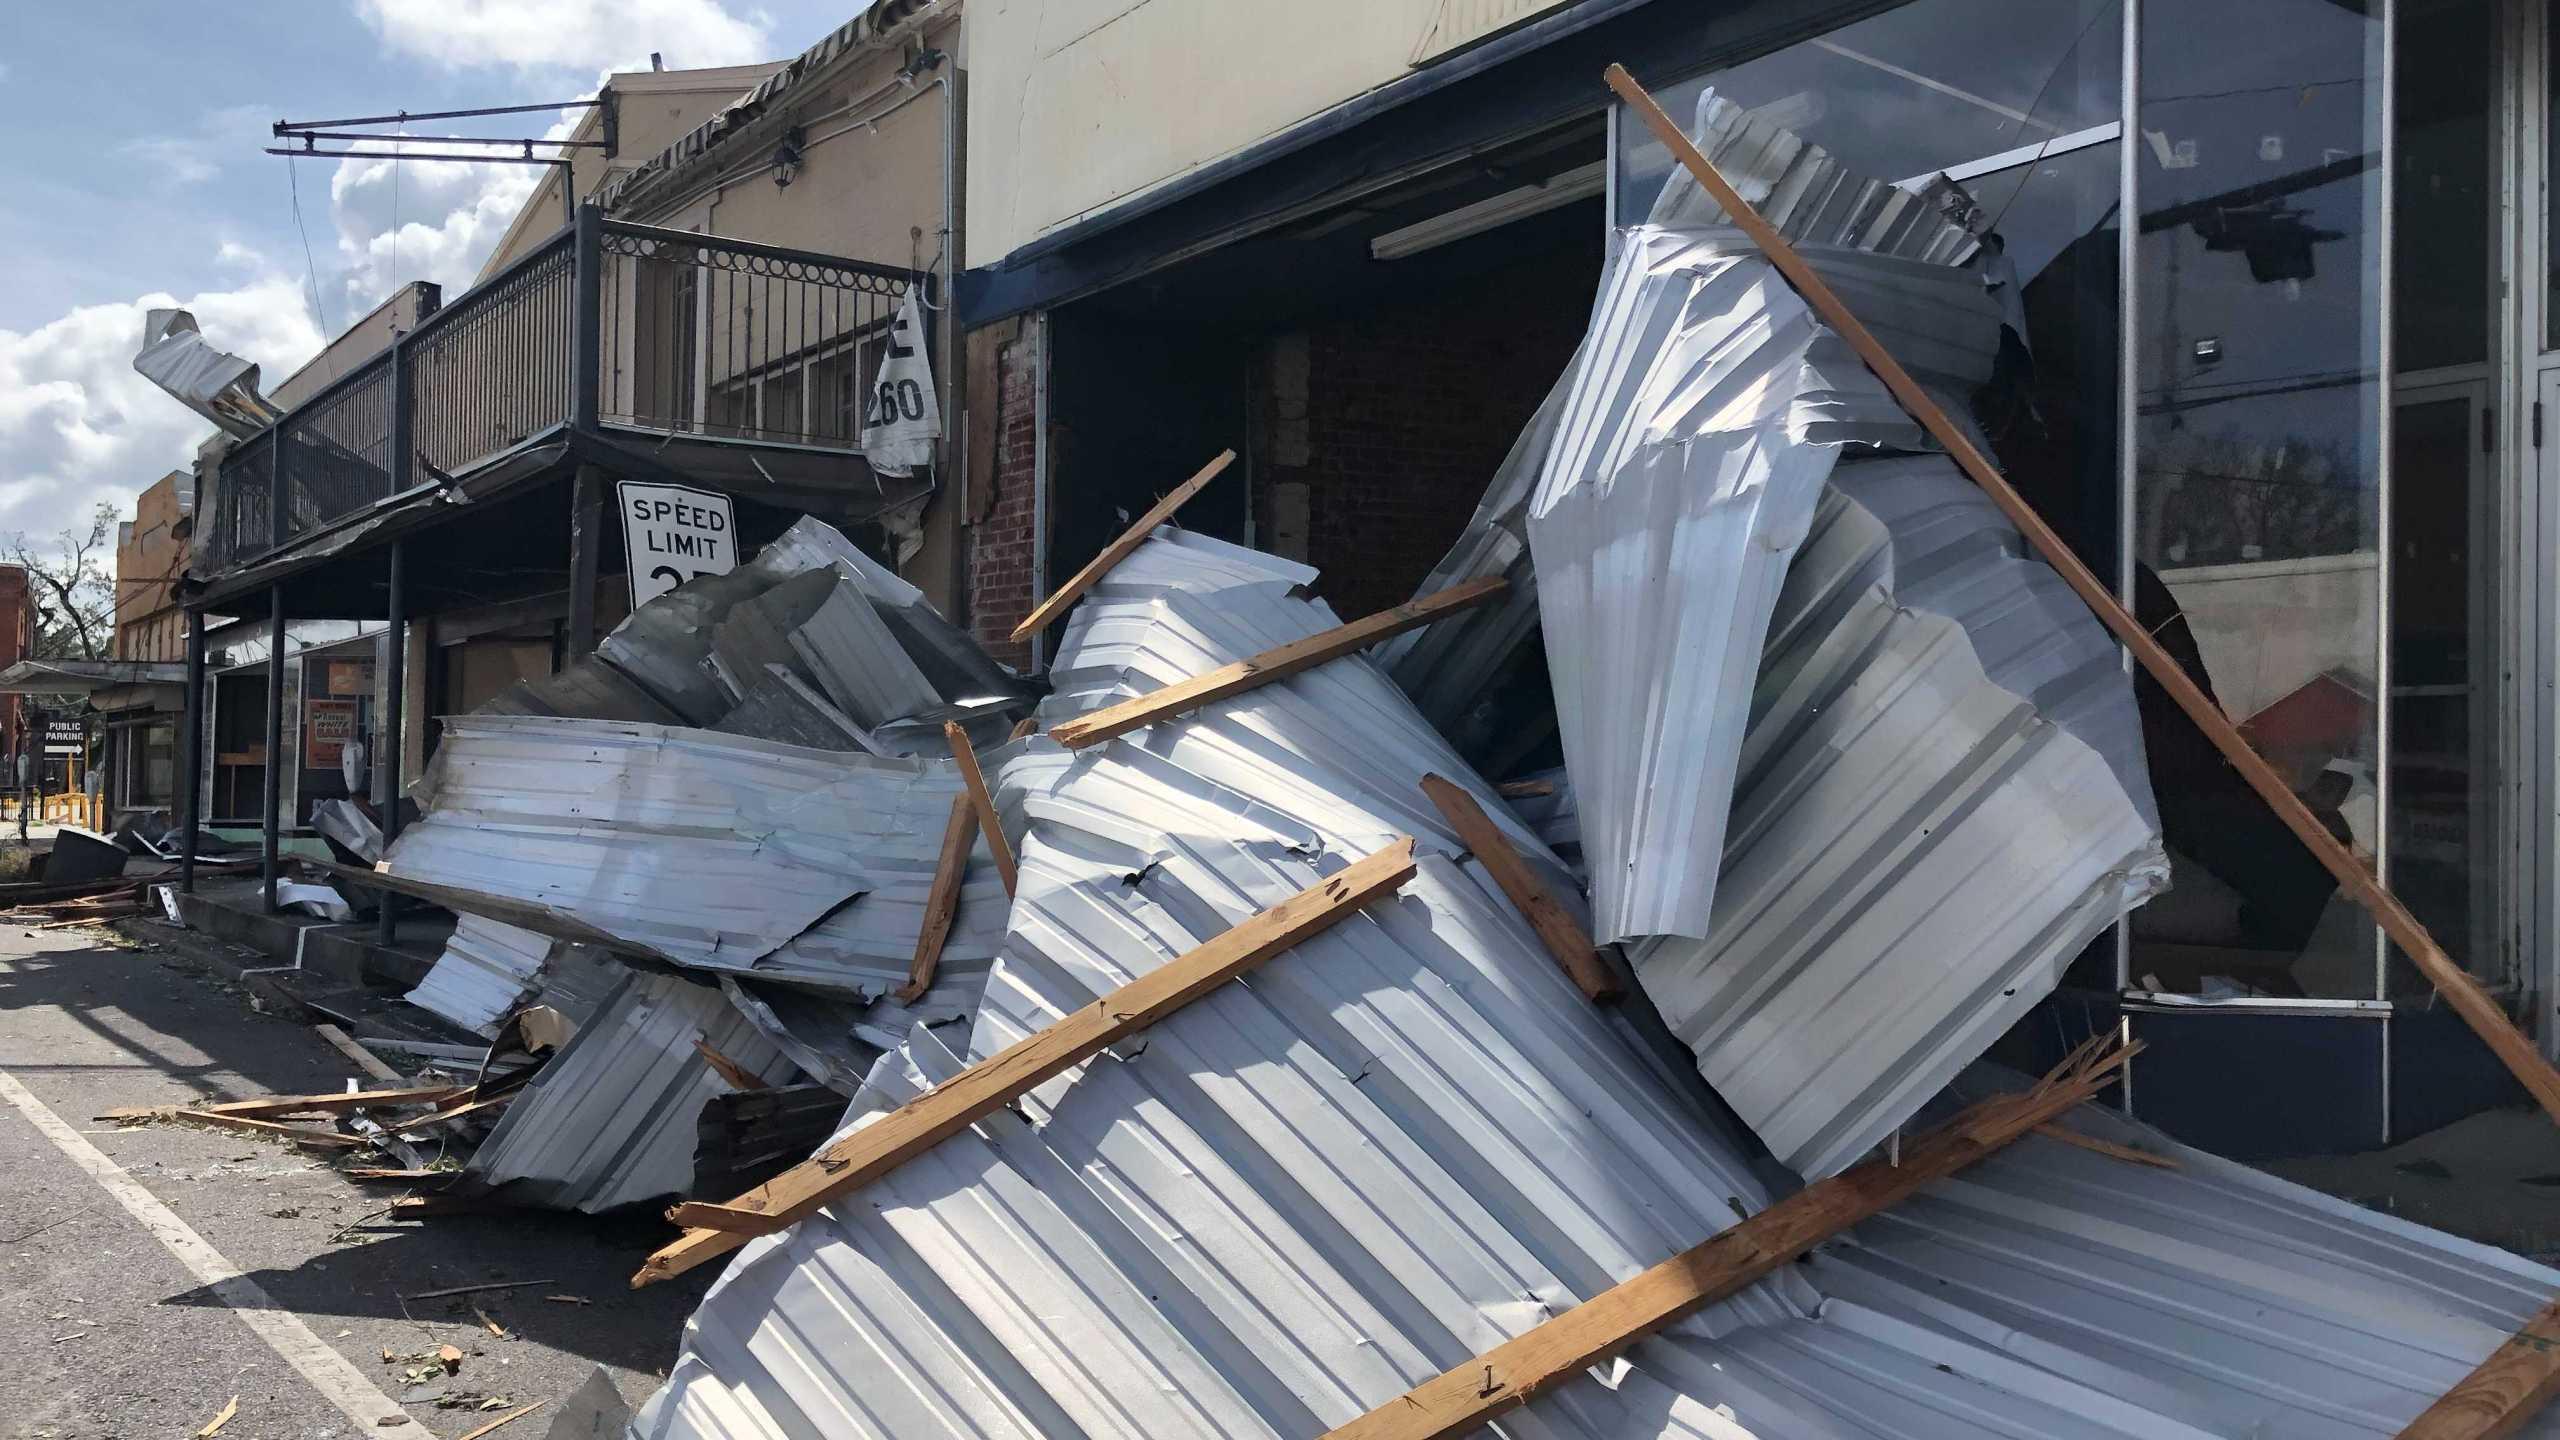 Damage in Houma, Louisiana after Hurricane Ida (KXAN Photo/David Yeomans)